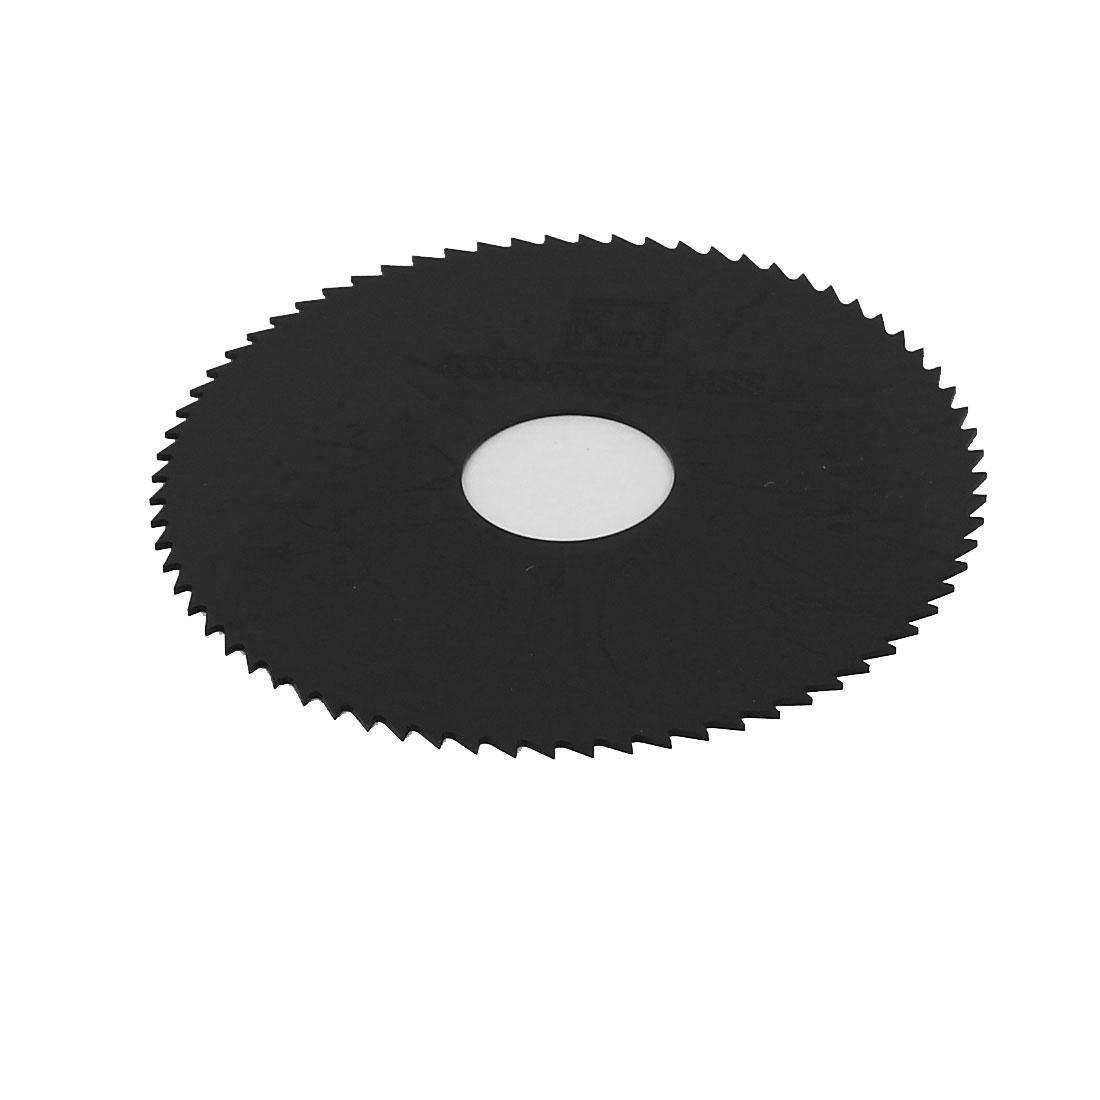 HSS 63mm x 0.6mm x 16mm 72T Teeth Round Cutting Disc Slitting Saw Cutter